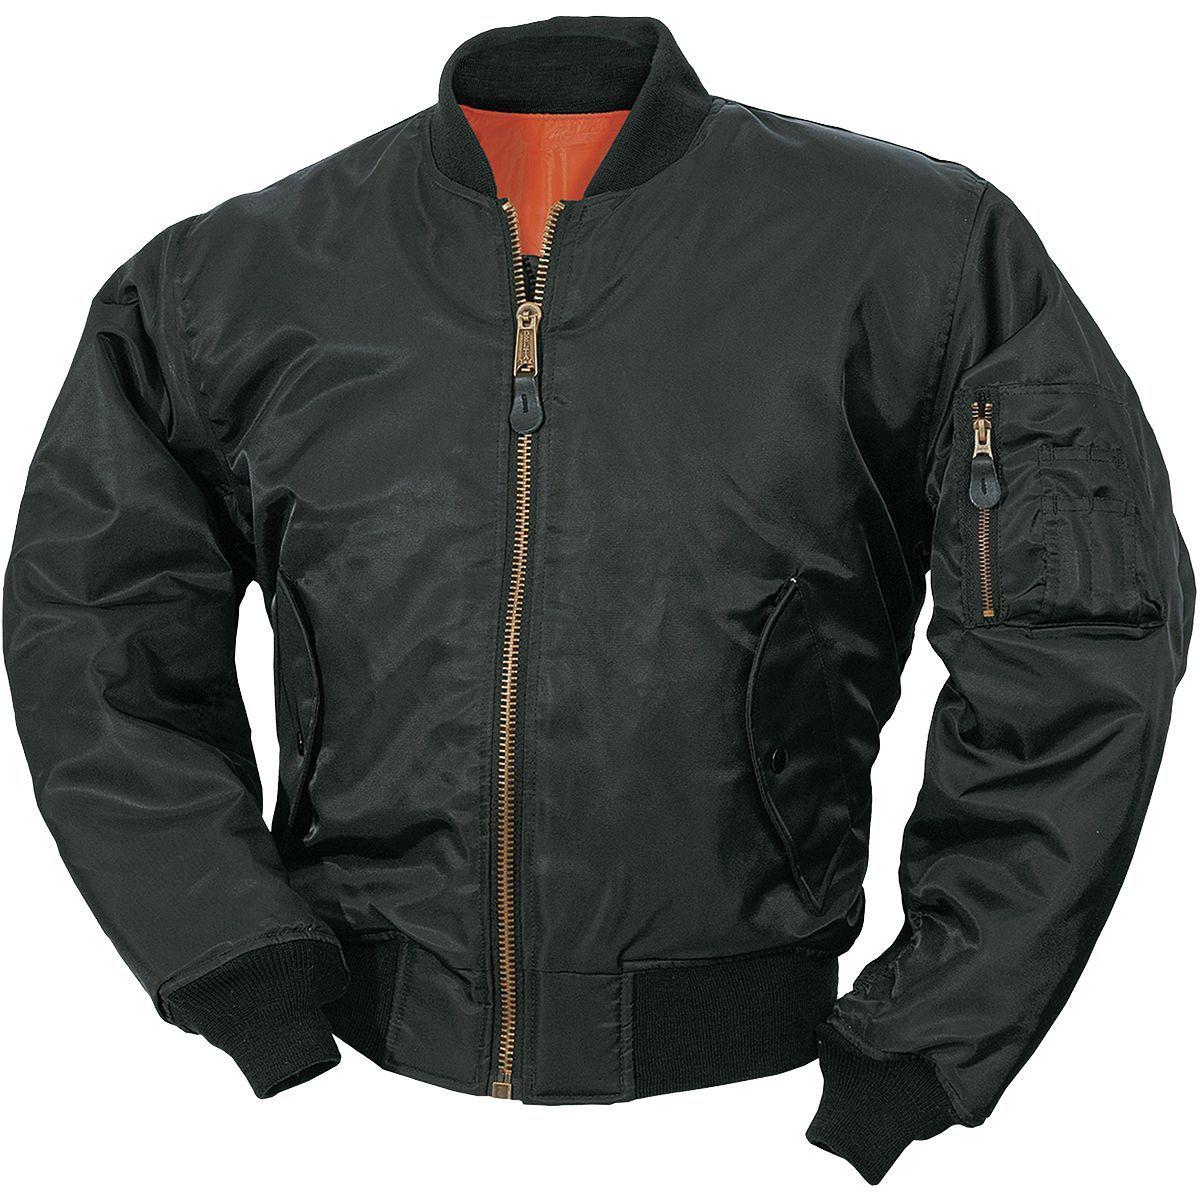 Surplus MA1 Flight Jacket Black Flight bomber jacket